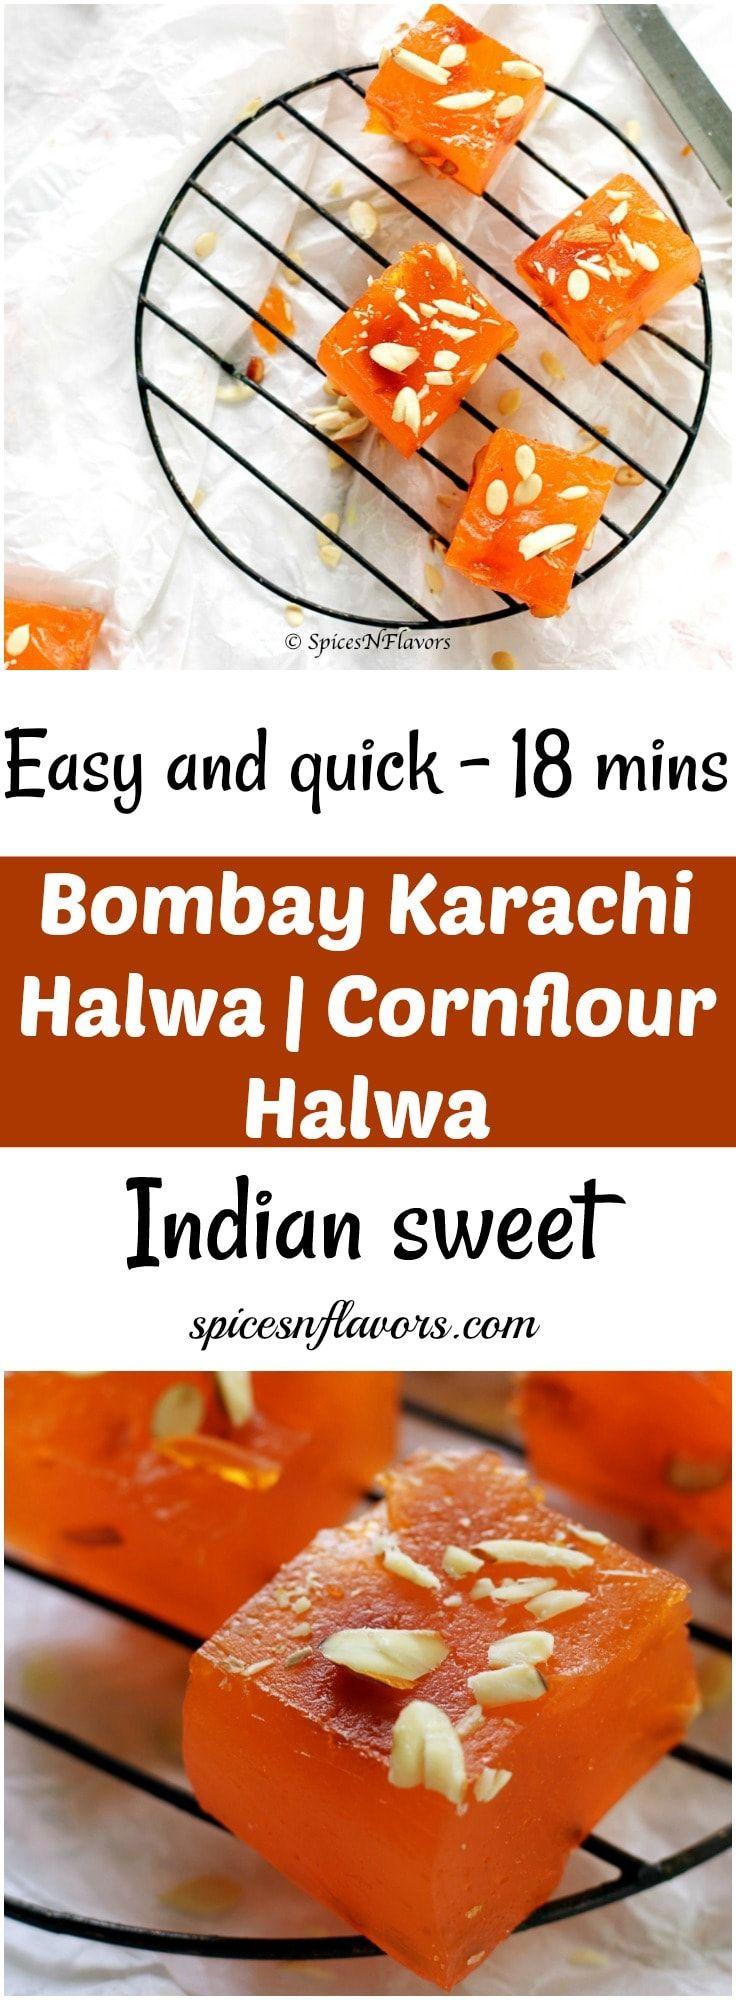 Easy quick indian sweet diwali recipe indian sweets microwave halwa cornflour halwa no cook halwa